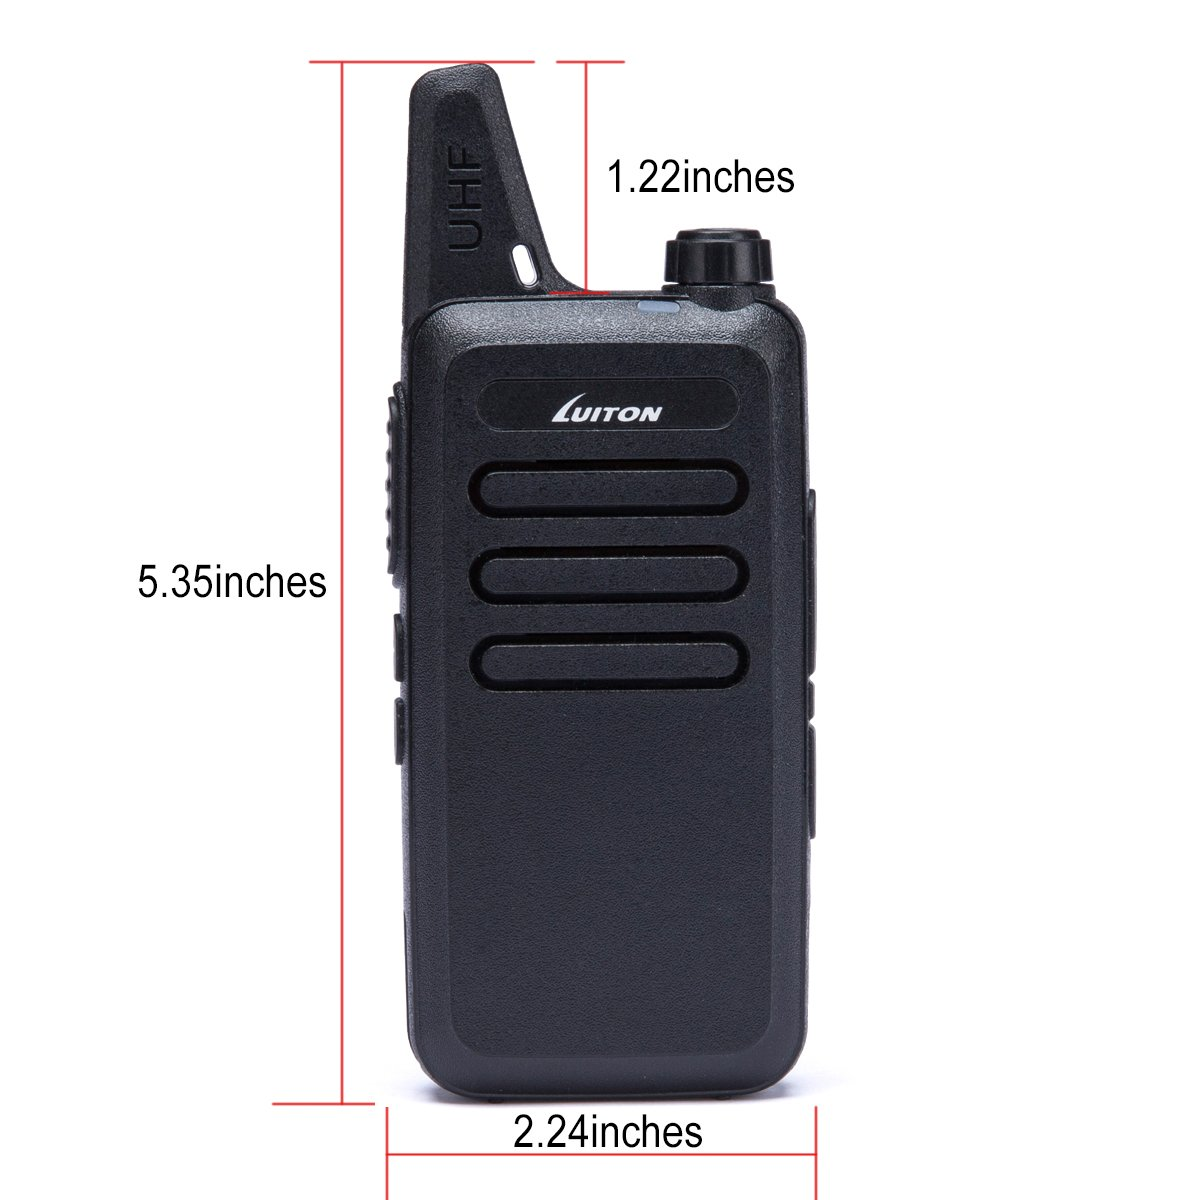 LUITON Mini Kids Walkie Talkies with Micro USB Charging LT-316 Uhf Two Way Radio (10 Pcs) by LUITON (Image #2)